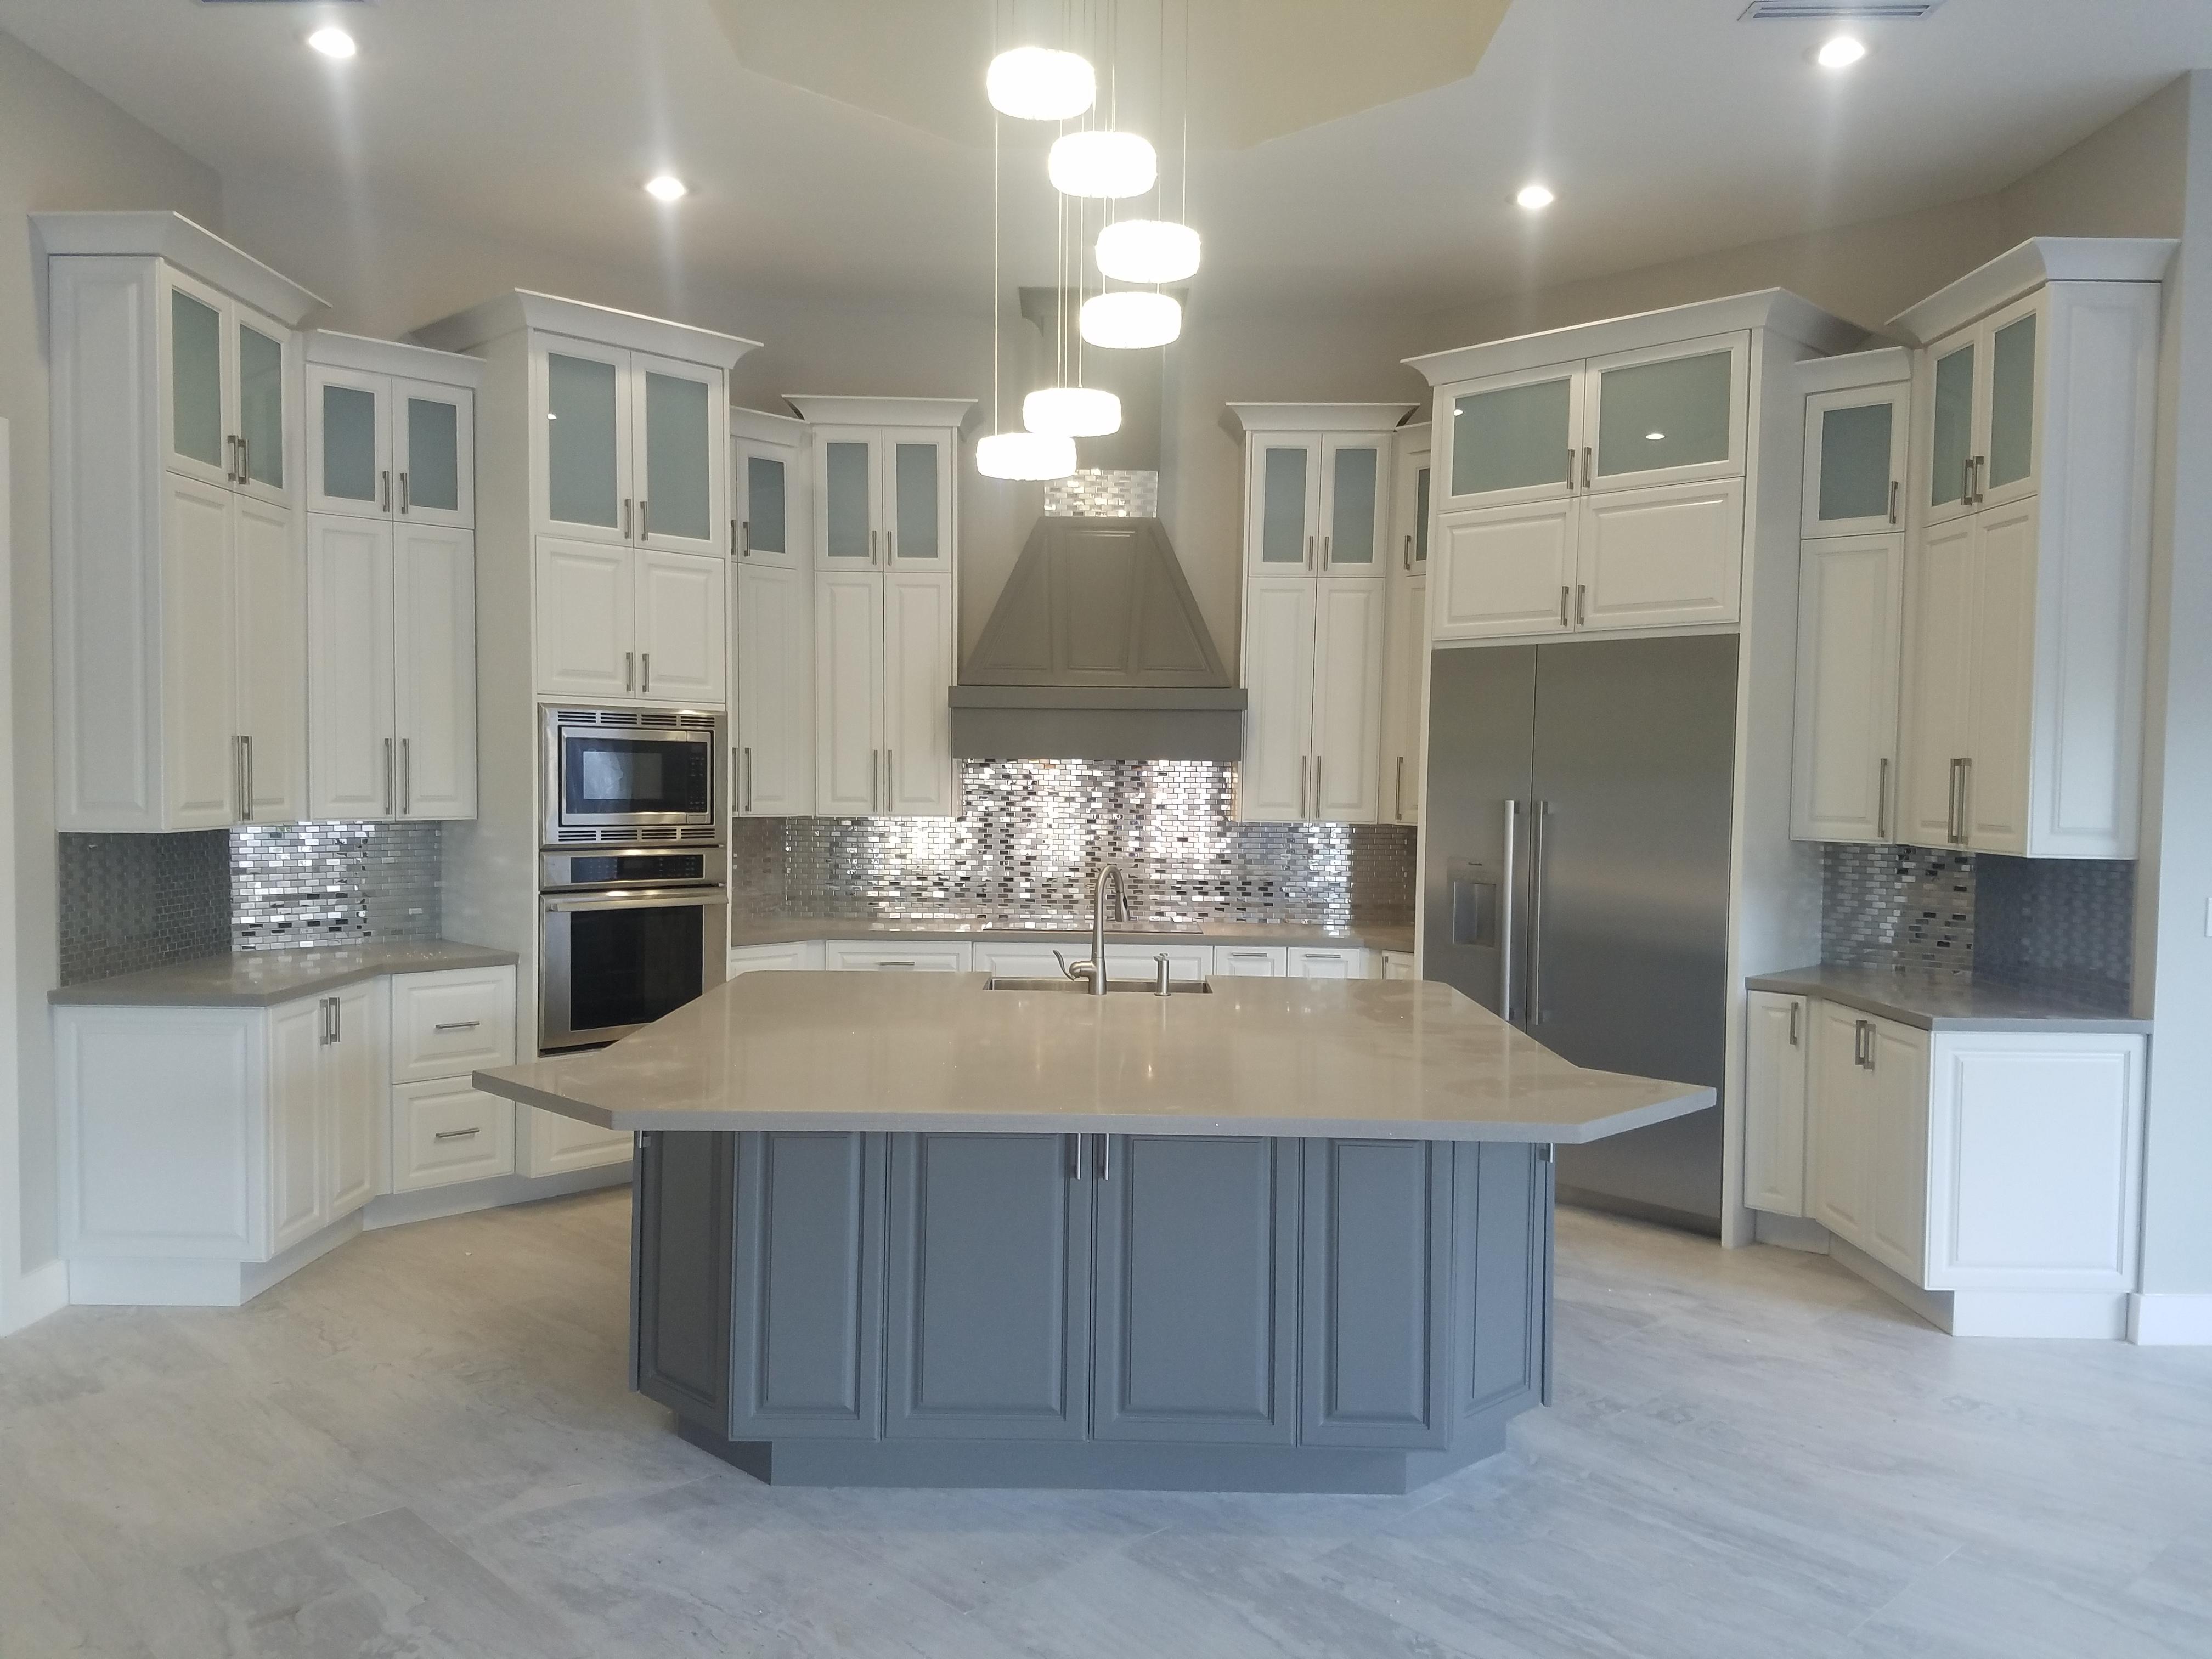 Espazio Design Custom Cabinets Construction 1633 N 10th St Suite A Mcallen Tx 78501 Yp Com